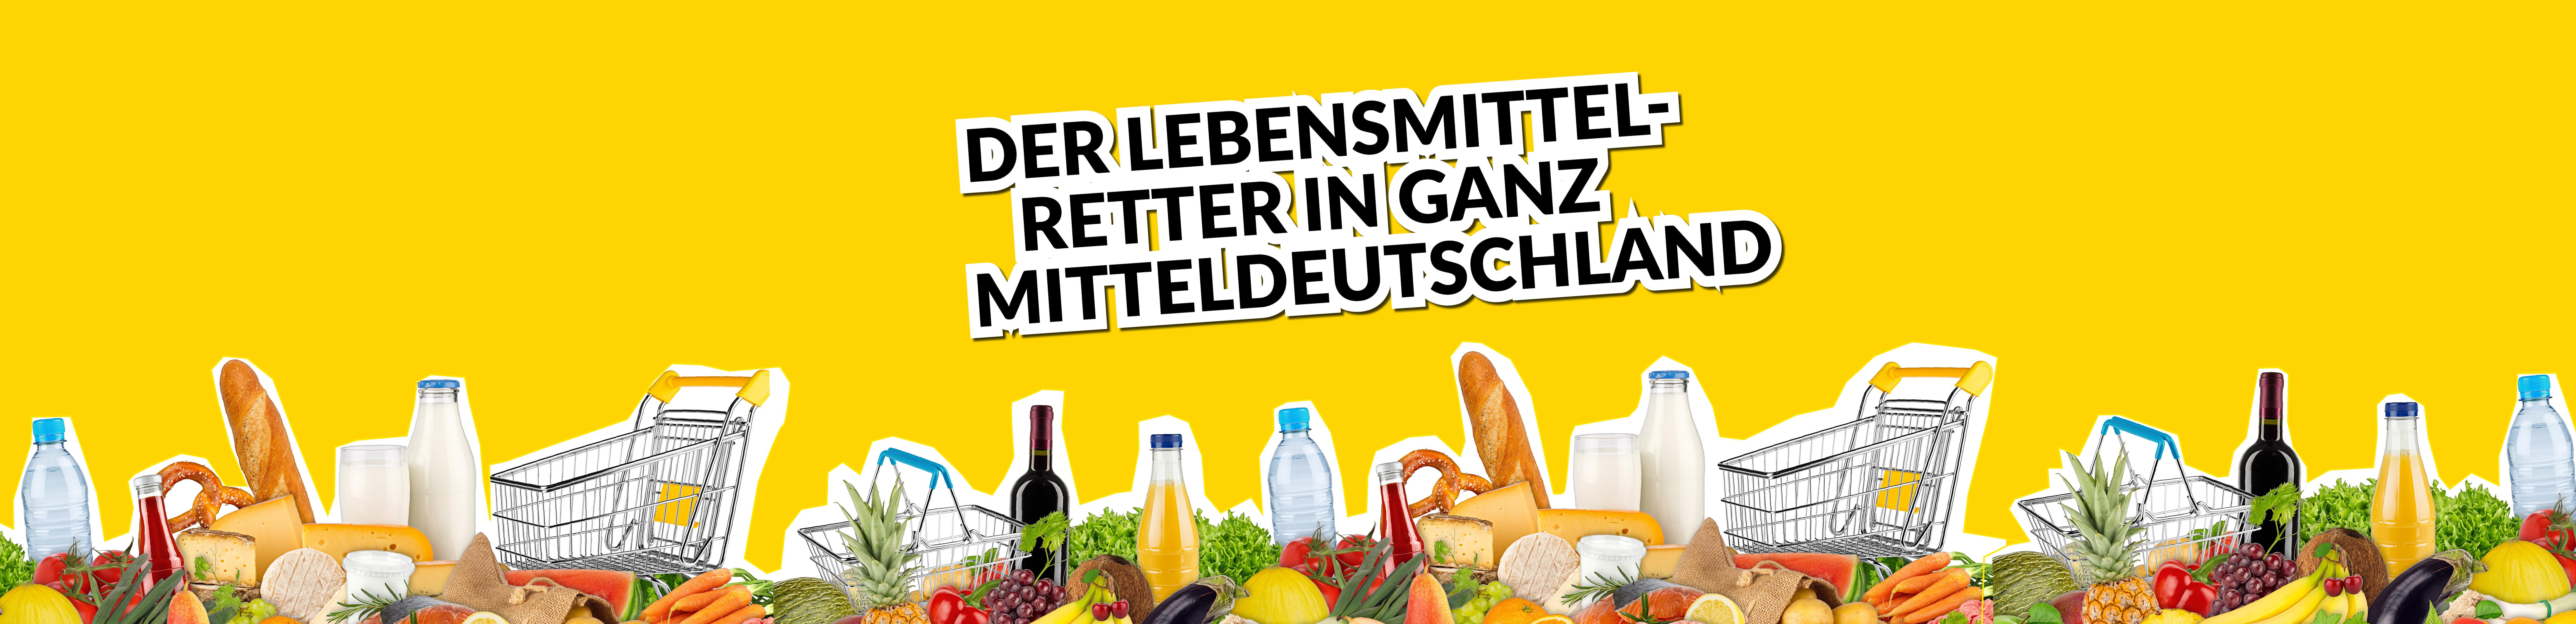 Lebensmittelretter-Mitteldeutschland-2